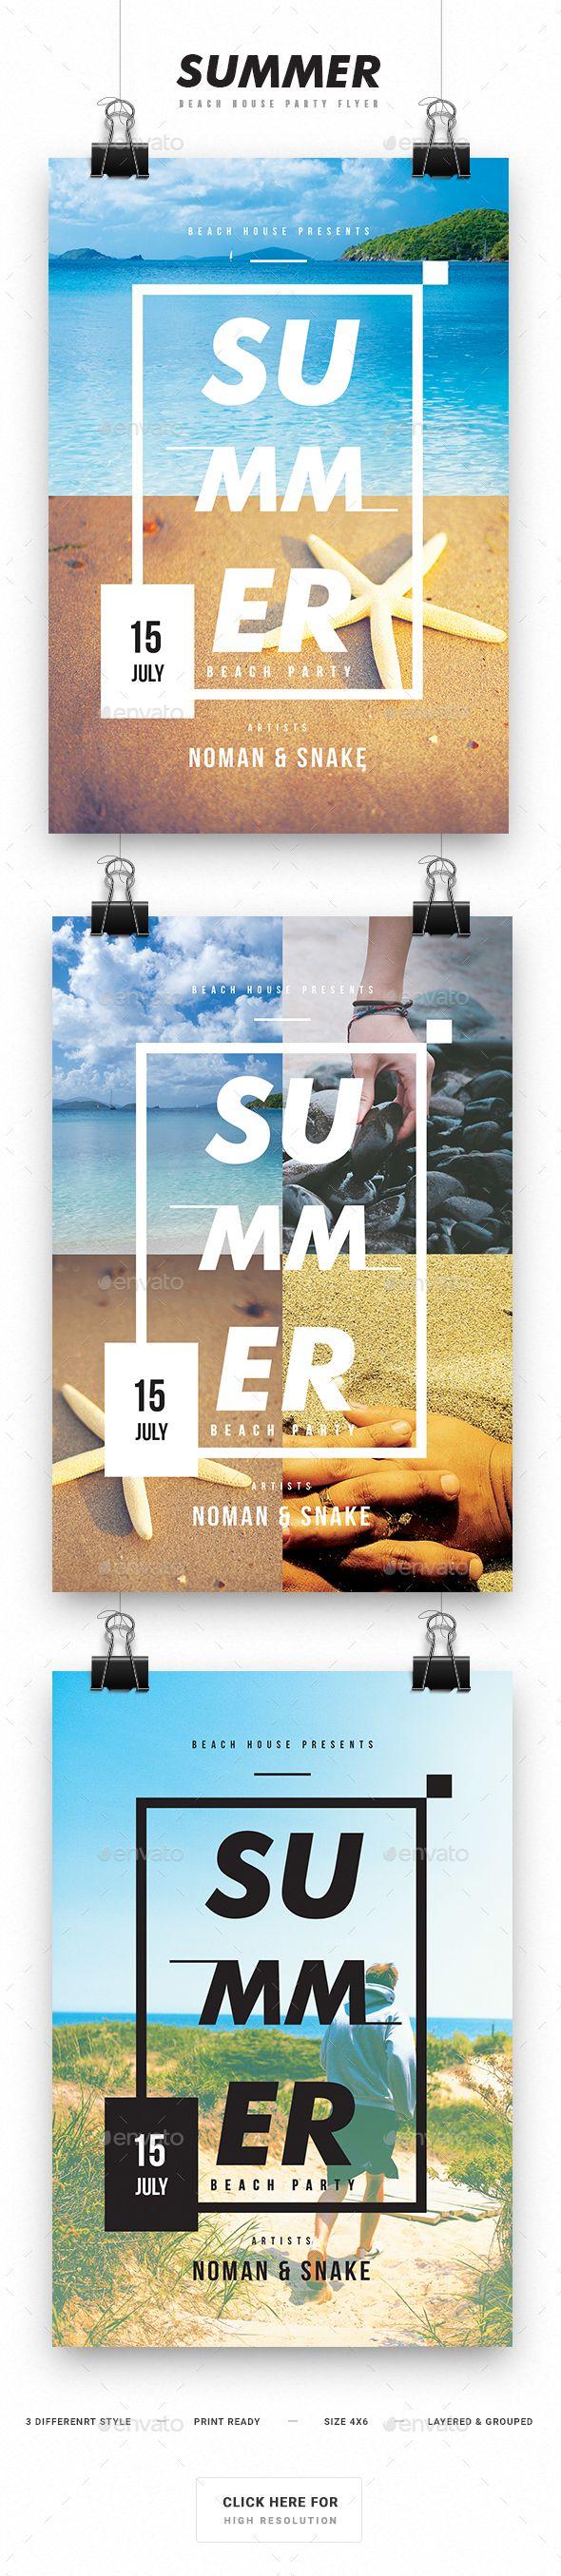 85 best Flyer & Poster images on Pinterest | Flyer template, Flyer ...